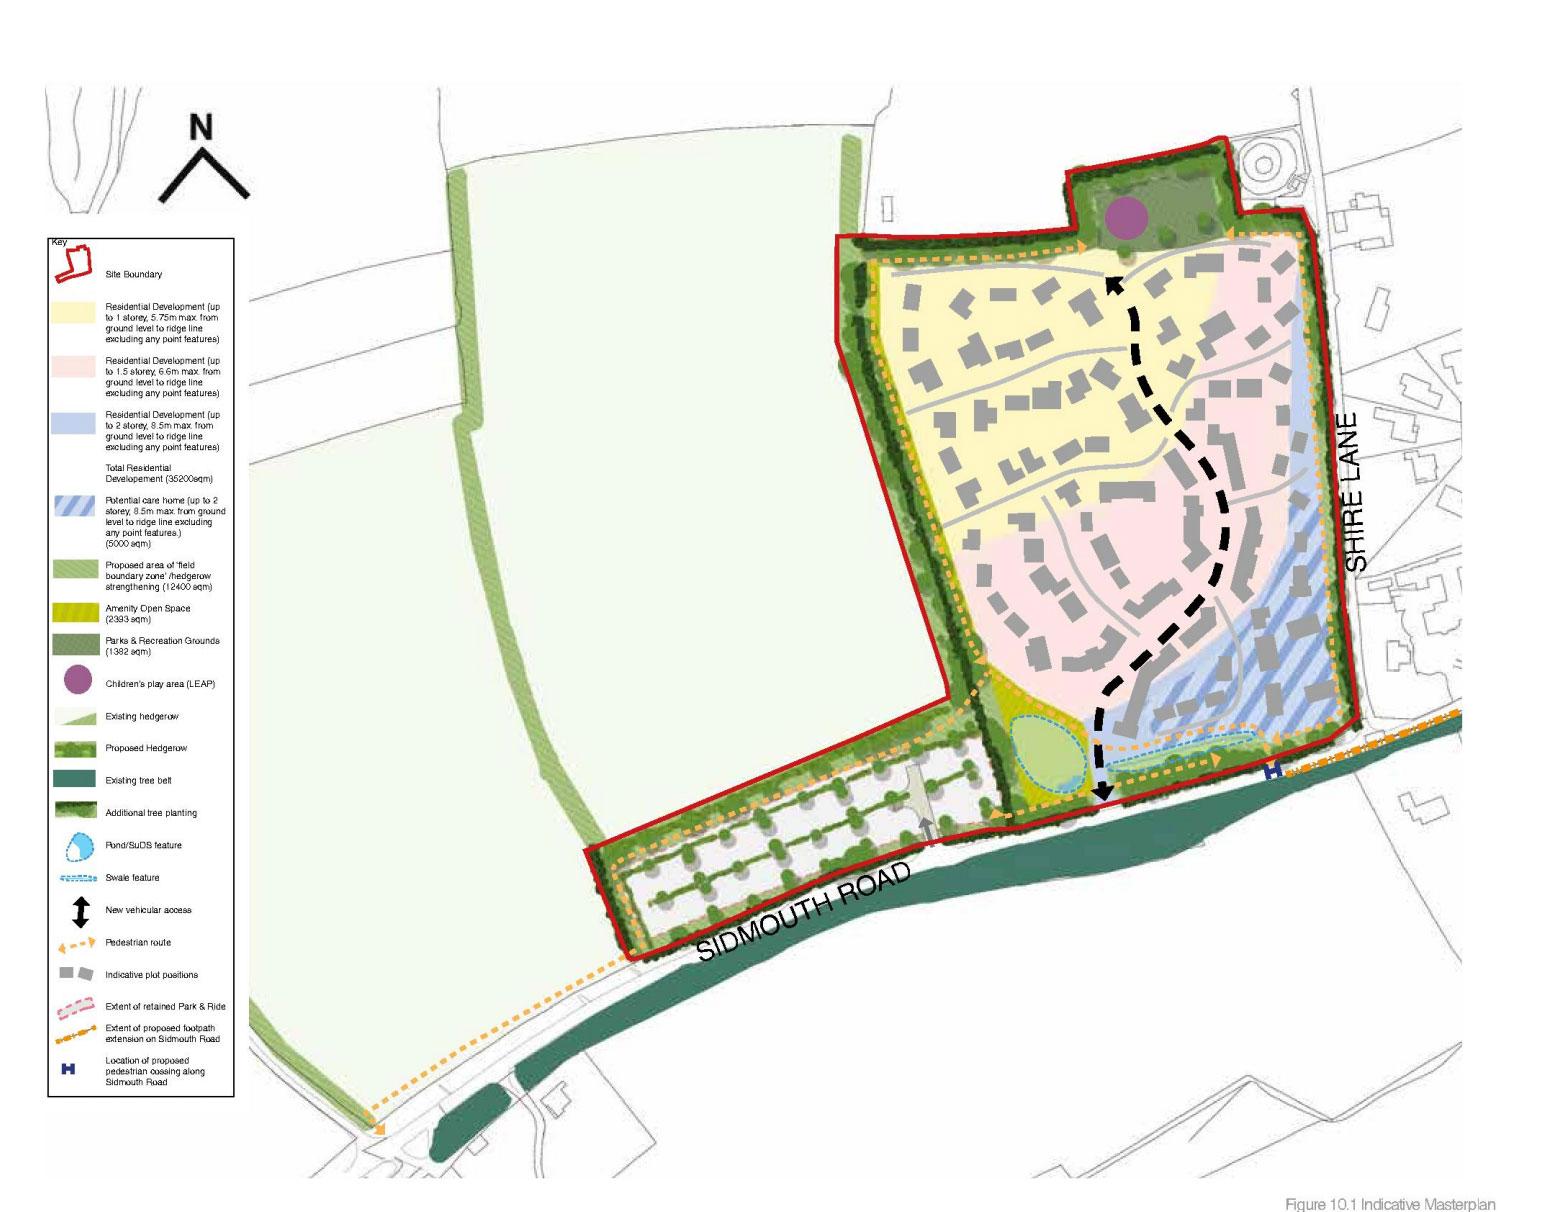 Site map, proposed development under application 15/0851/MOUT